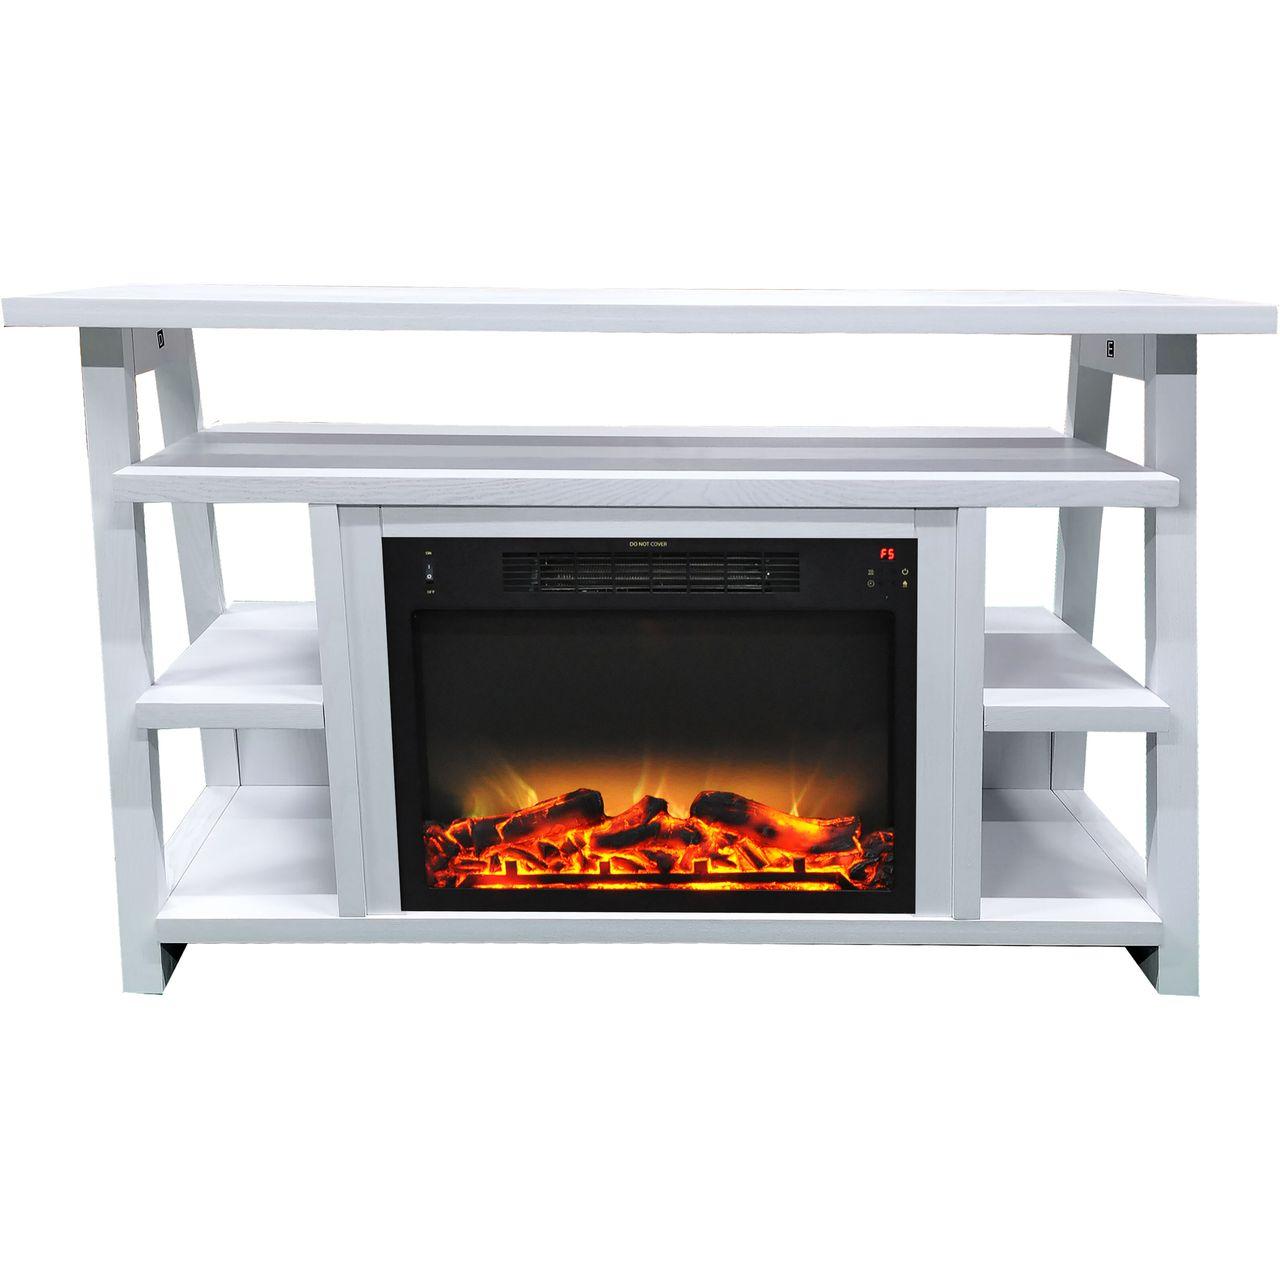 "Cambridge 32"" Sawyer Electric Fireplace Mantel/Logs/Grate - White"